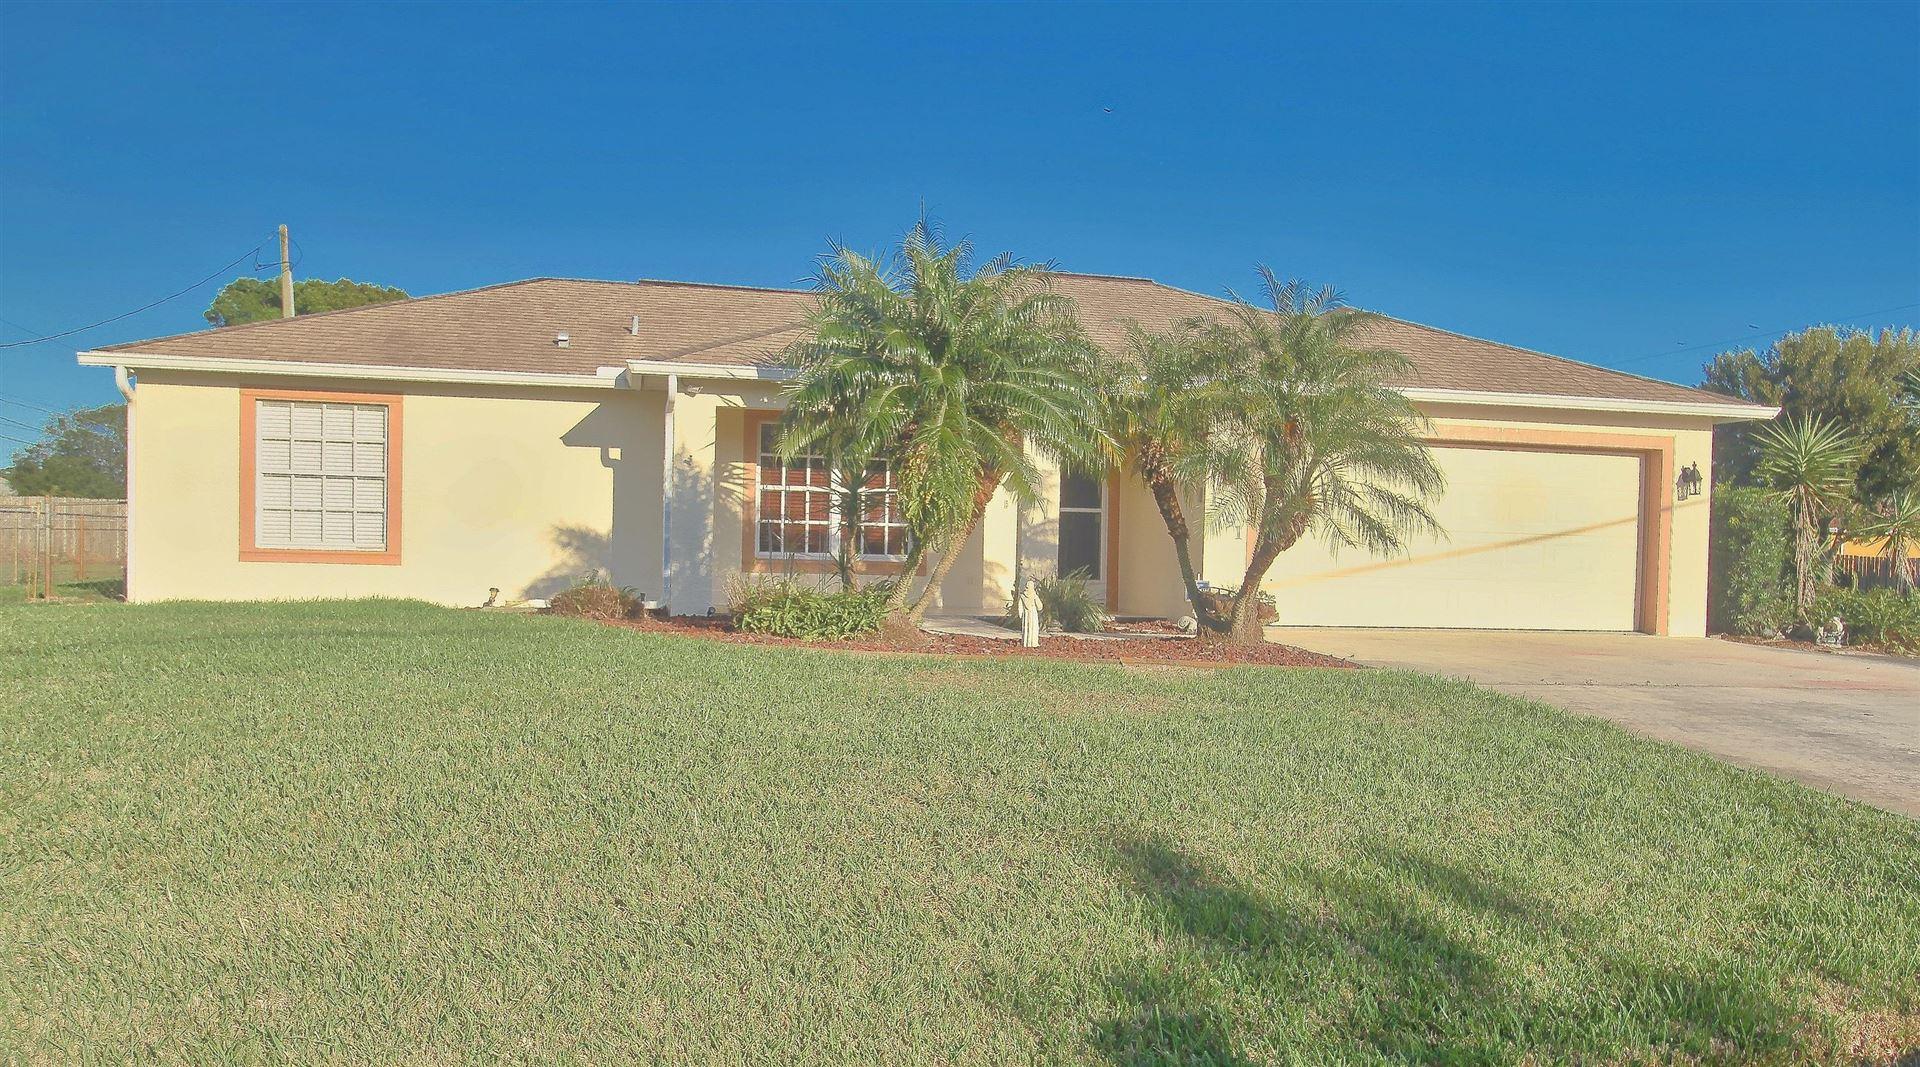 1791 SE Flintlock Road, Port Saint Lucie, FL 34952 - #: RX-10706993